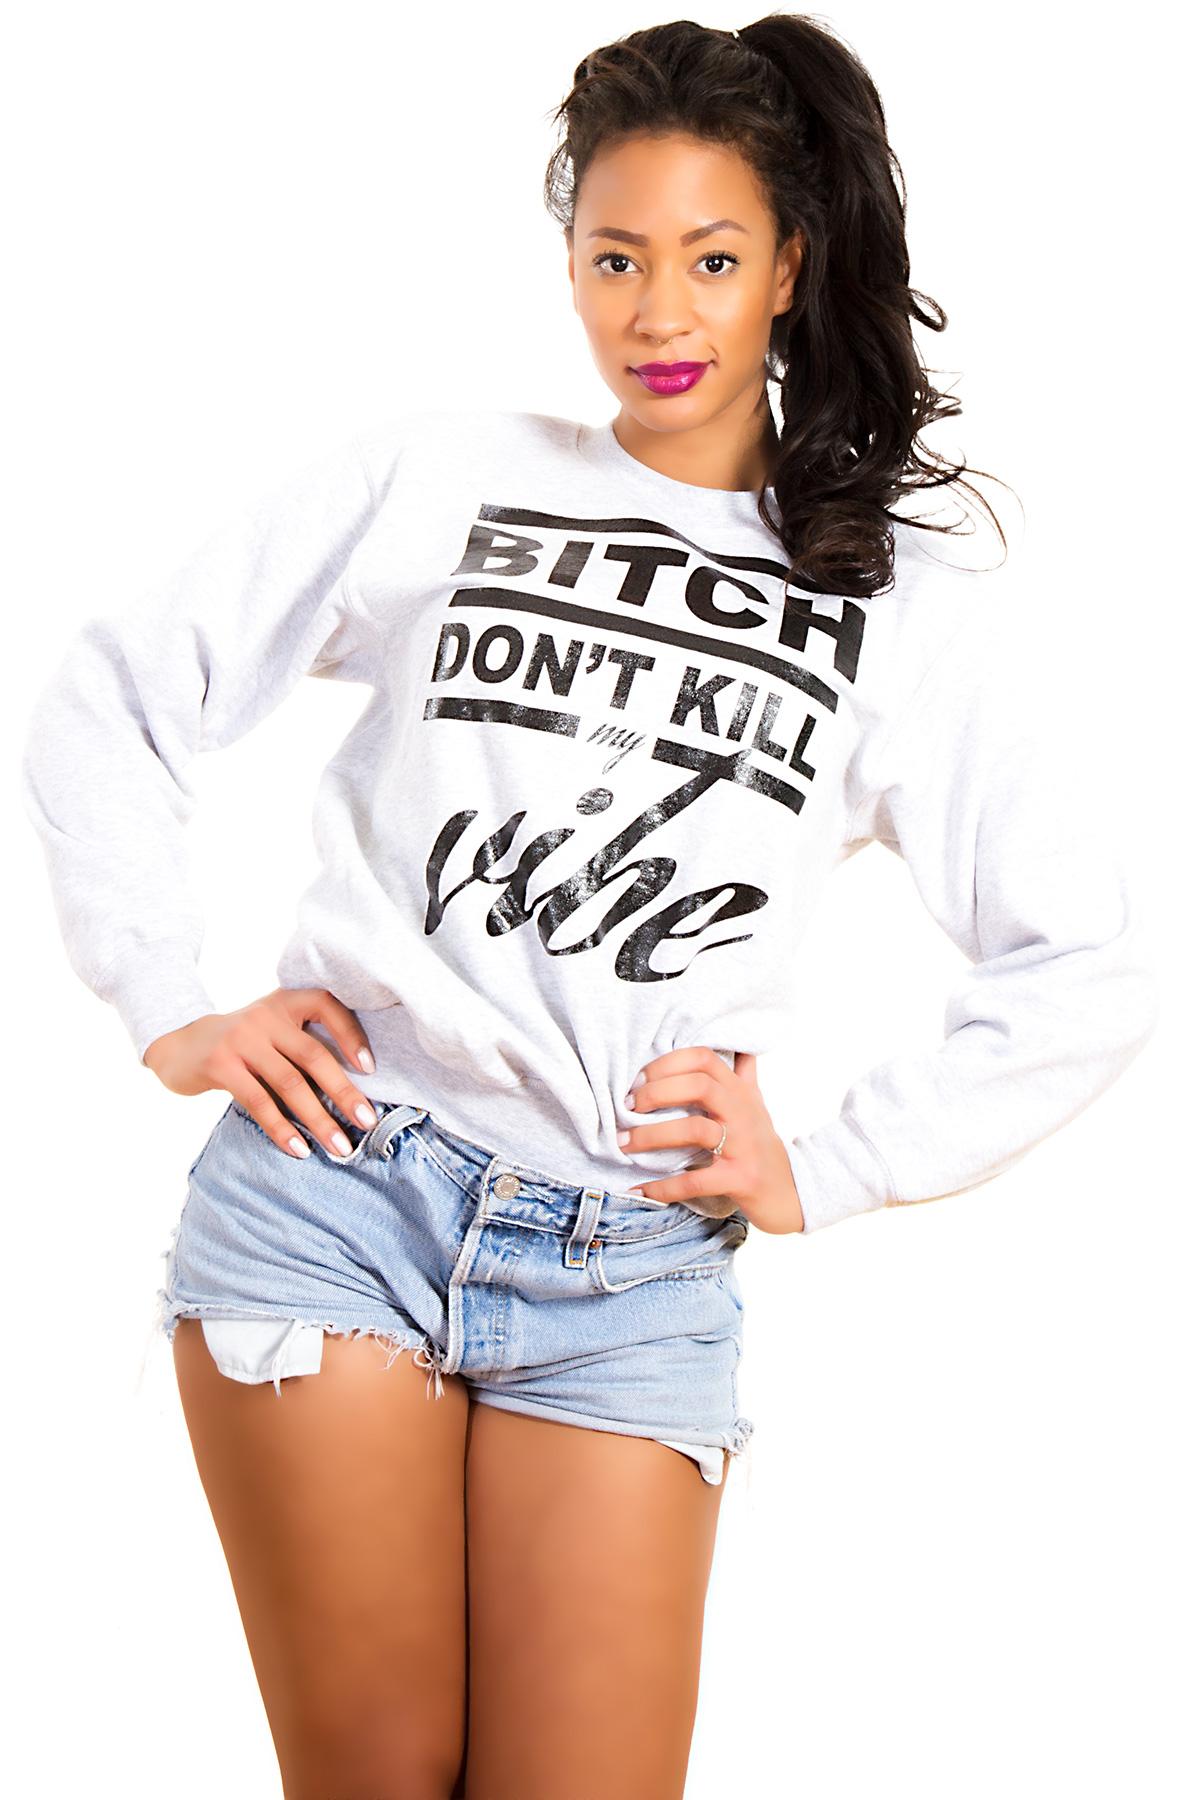 Hyori Bitch Don't Kill My Vibe Sweatshirt in Gray for Women